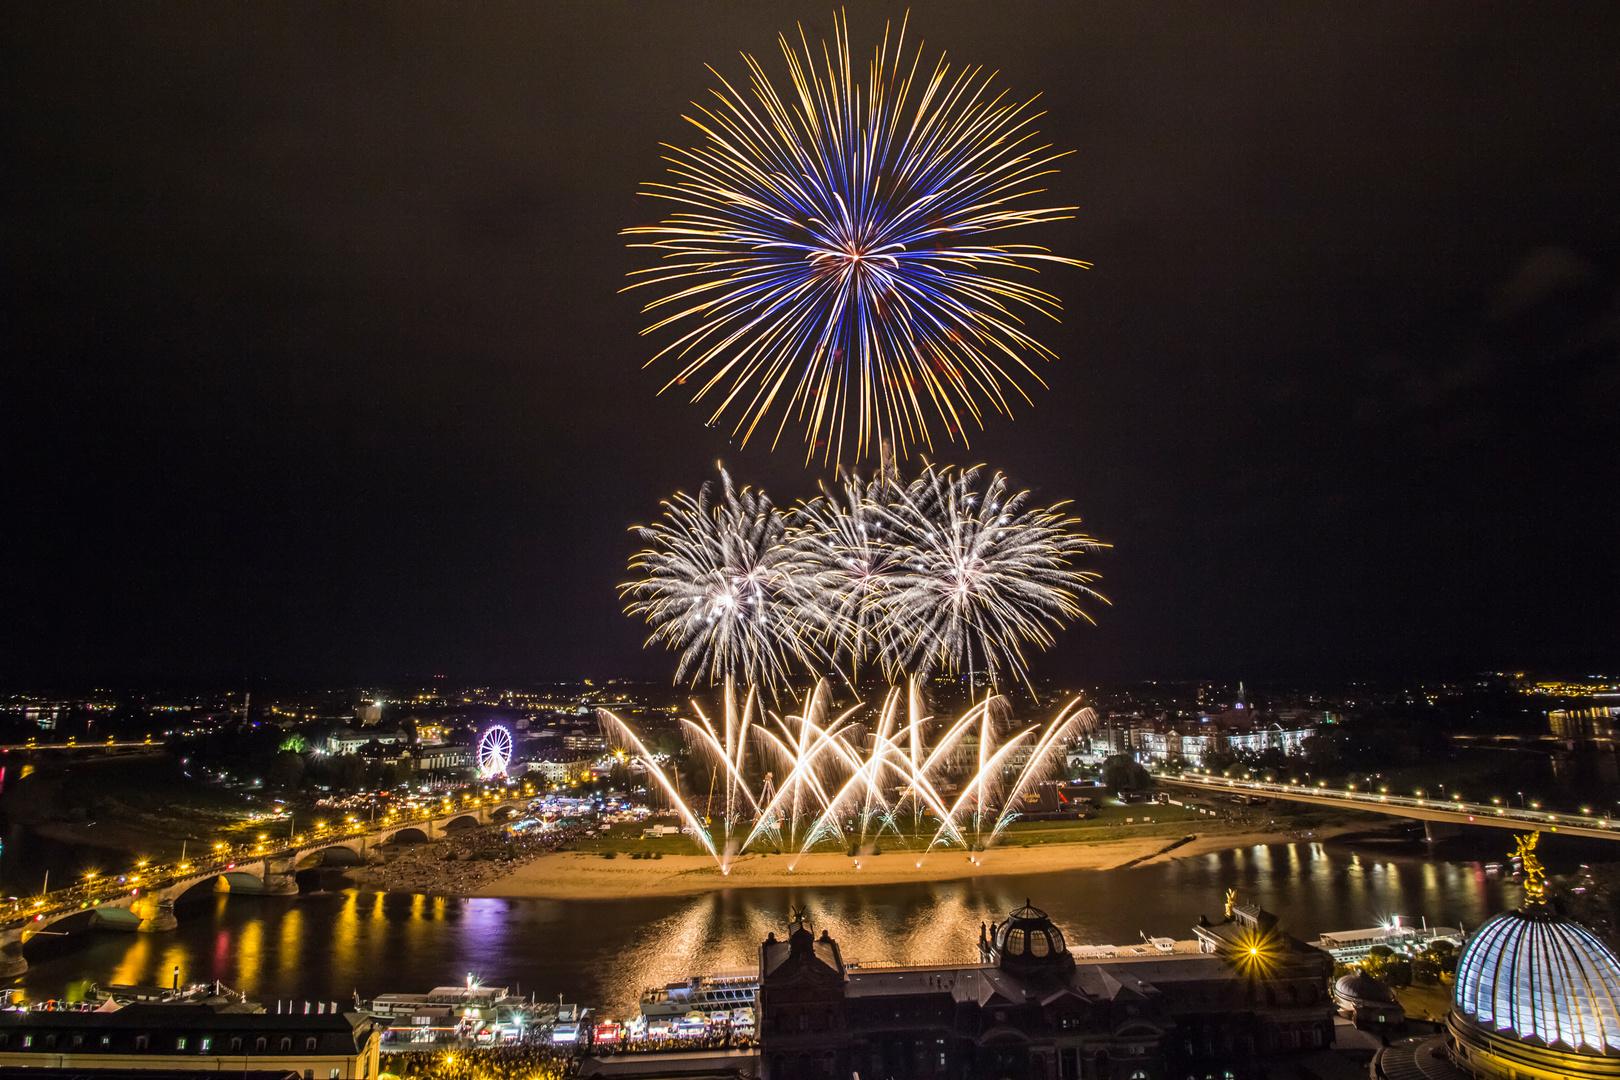 Abschlussfeuerwerk Stadtfest Dresden 2014